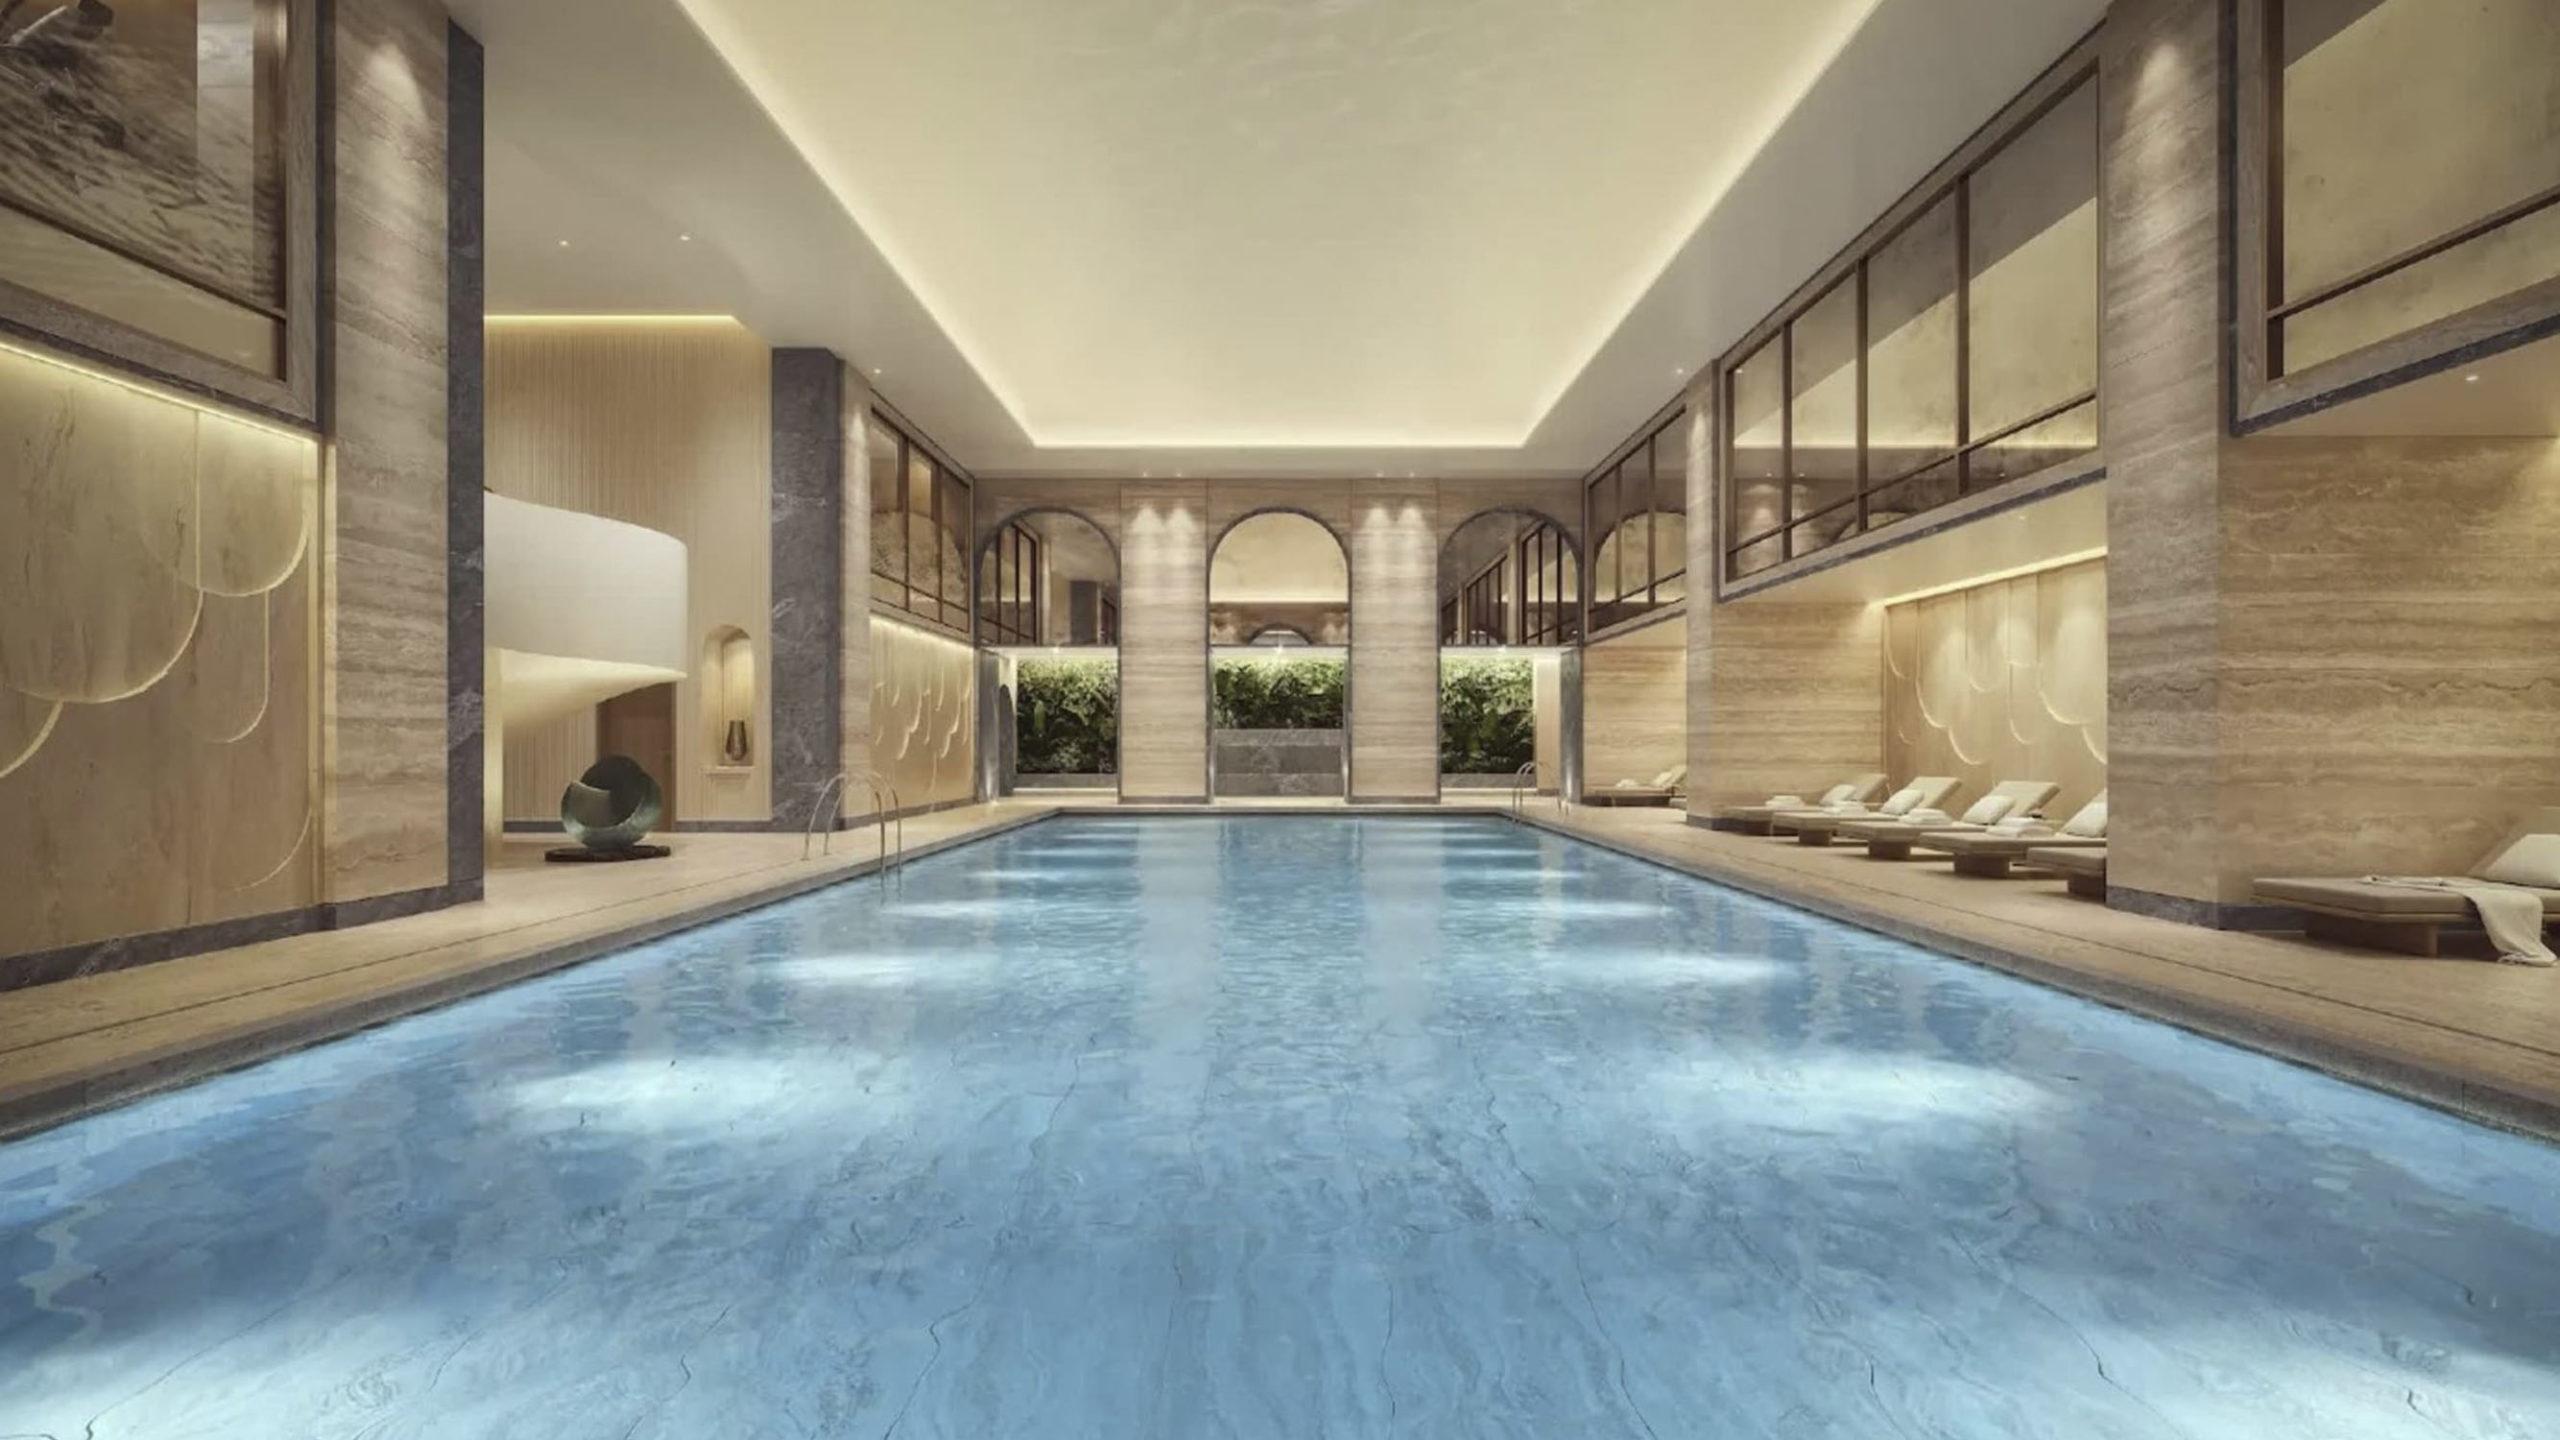 The OWO Residences Swimming pool